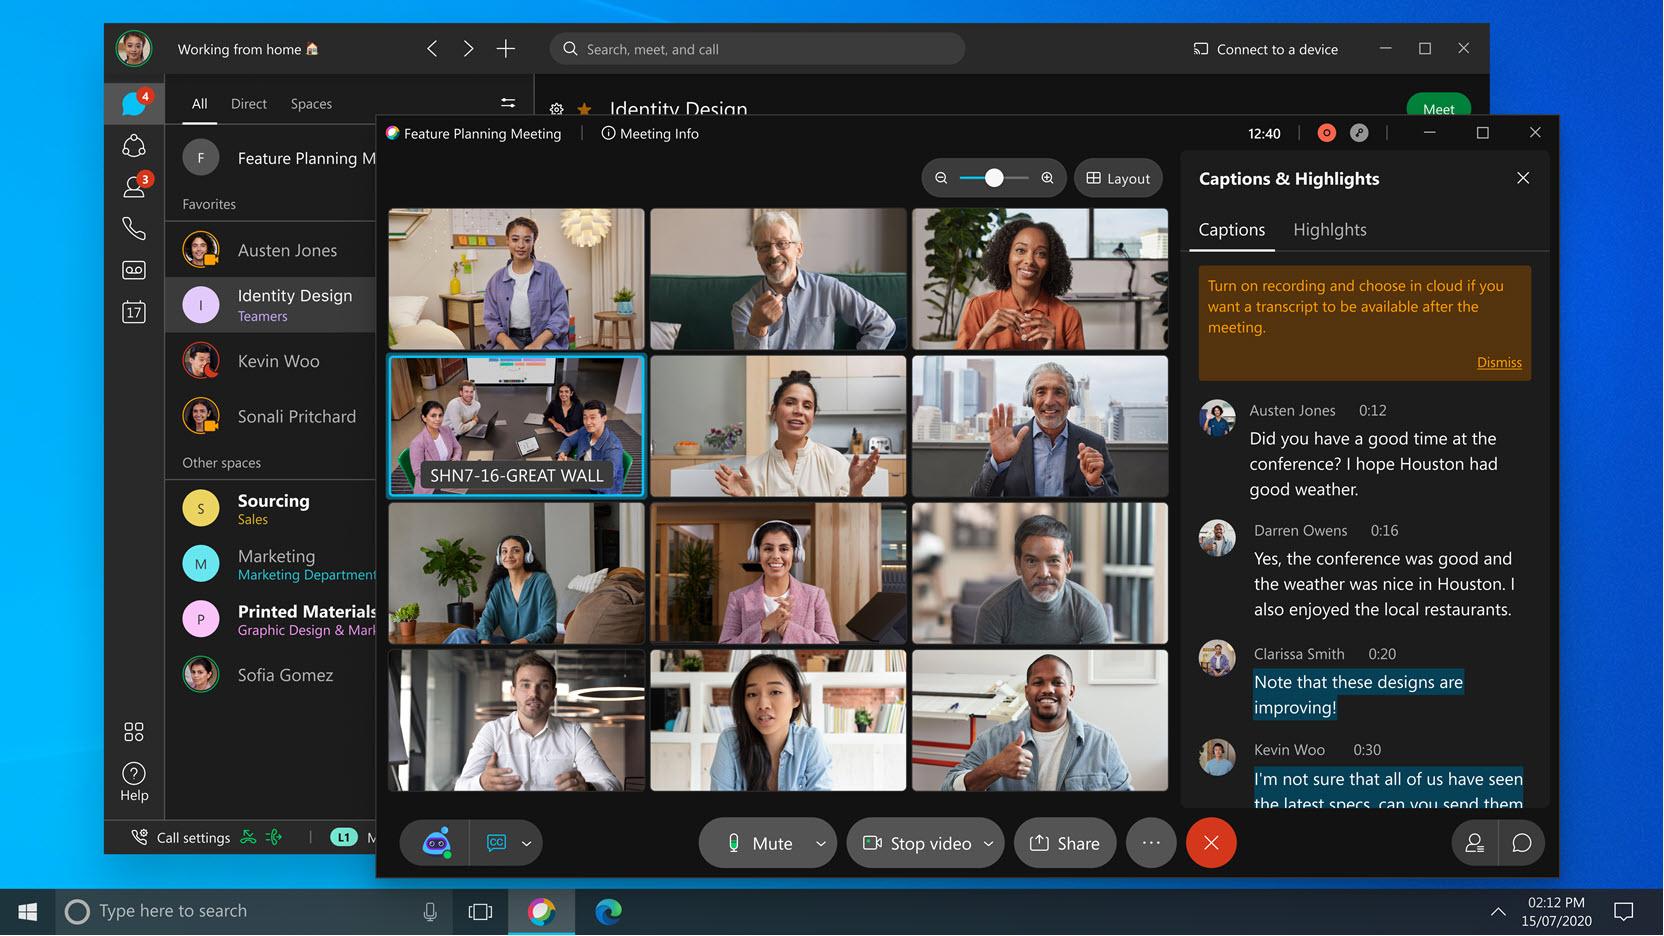 Asystent Webex dla usługi Meetings